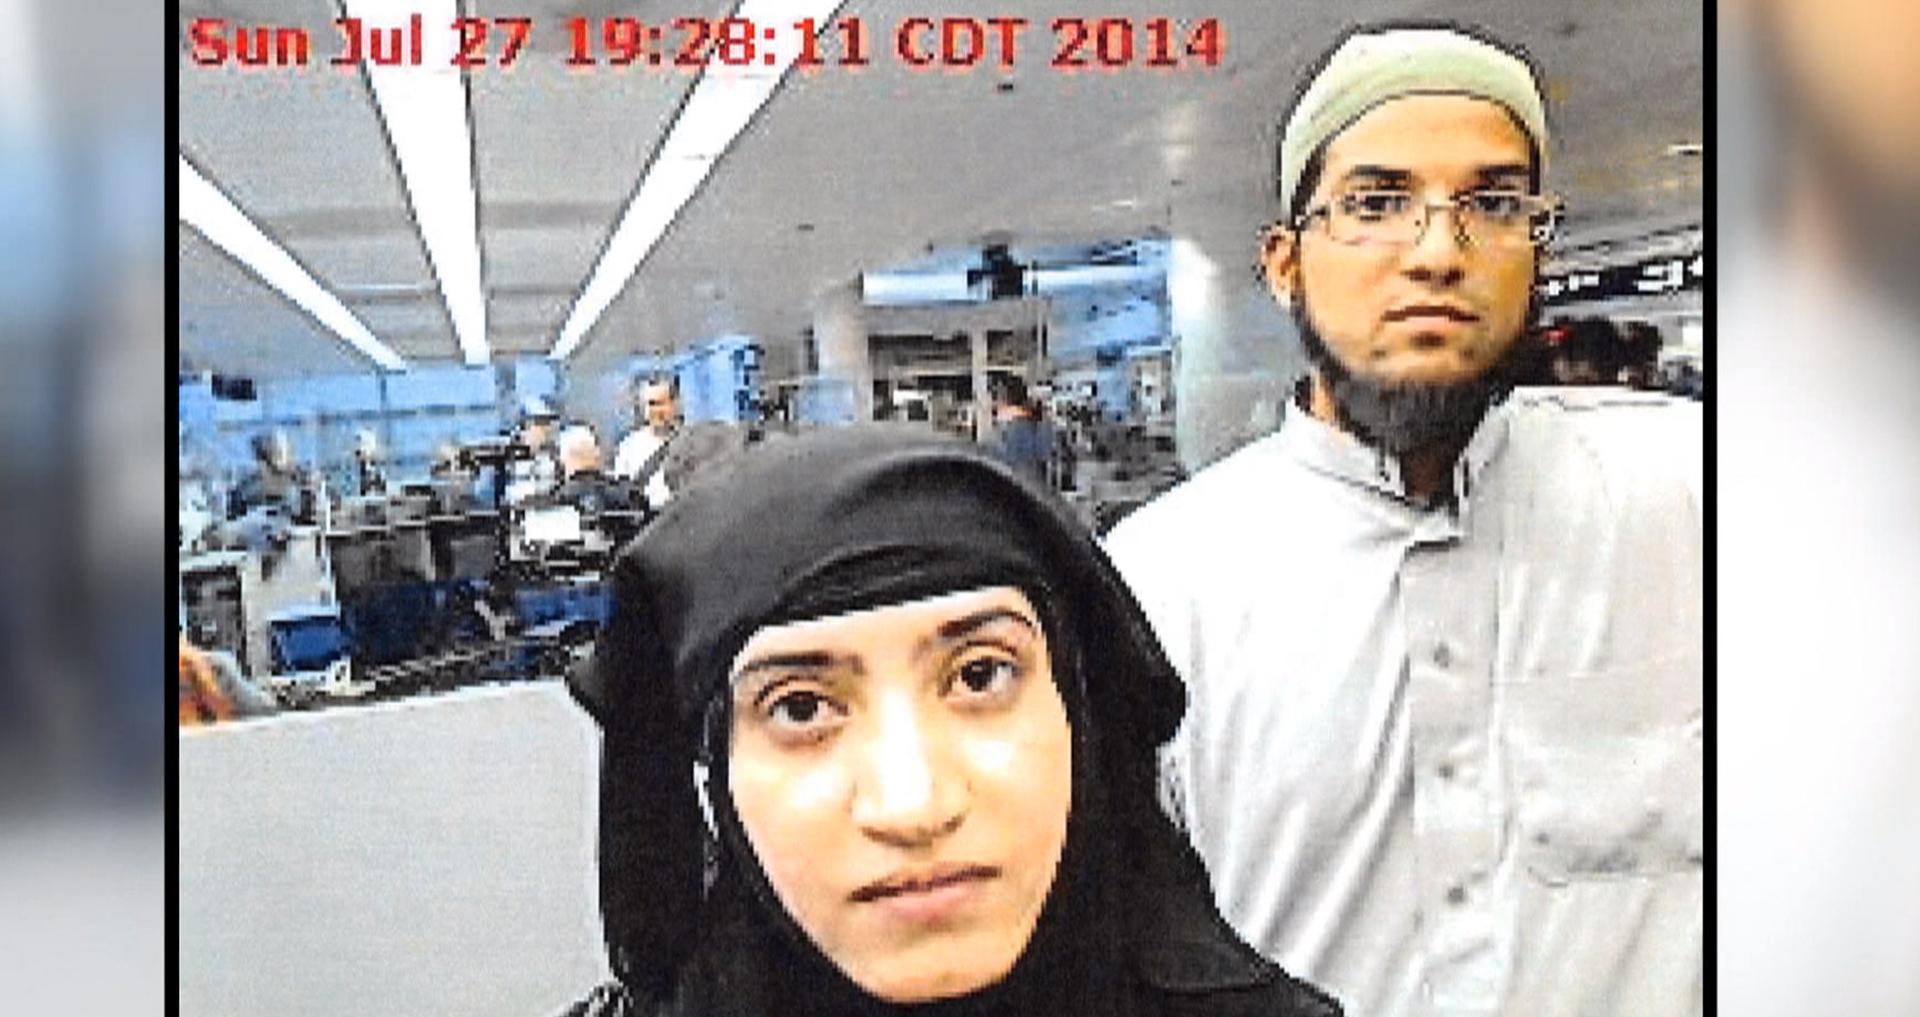 San Bernardino shooting: Father says Syed Rizwan Farook